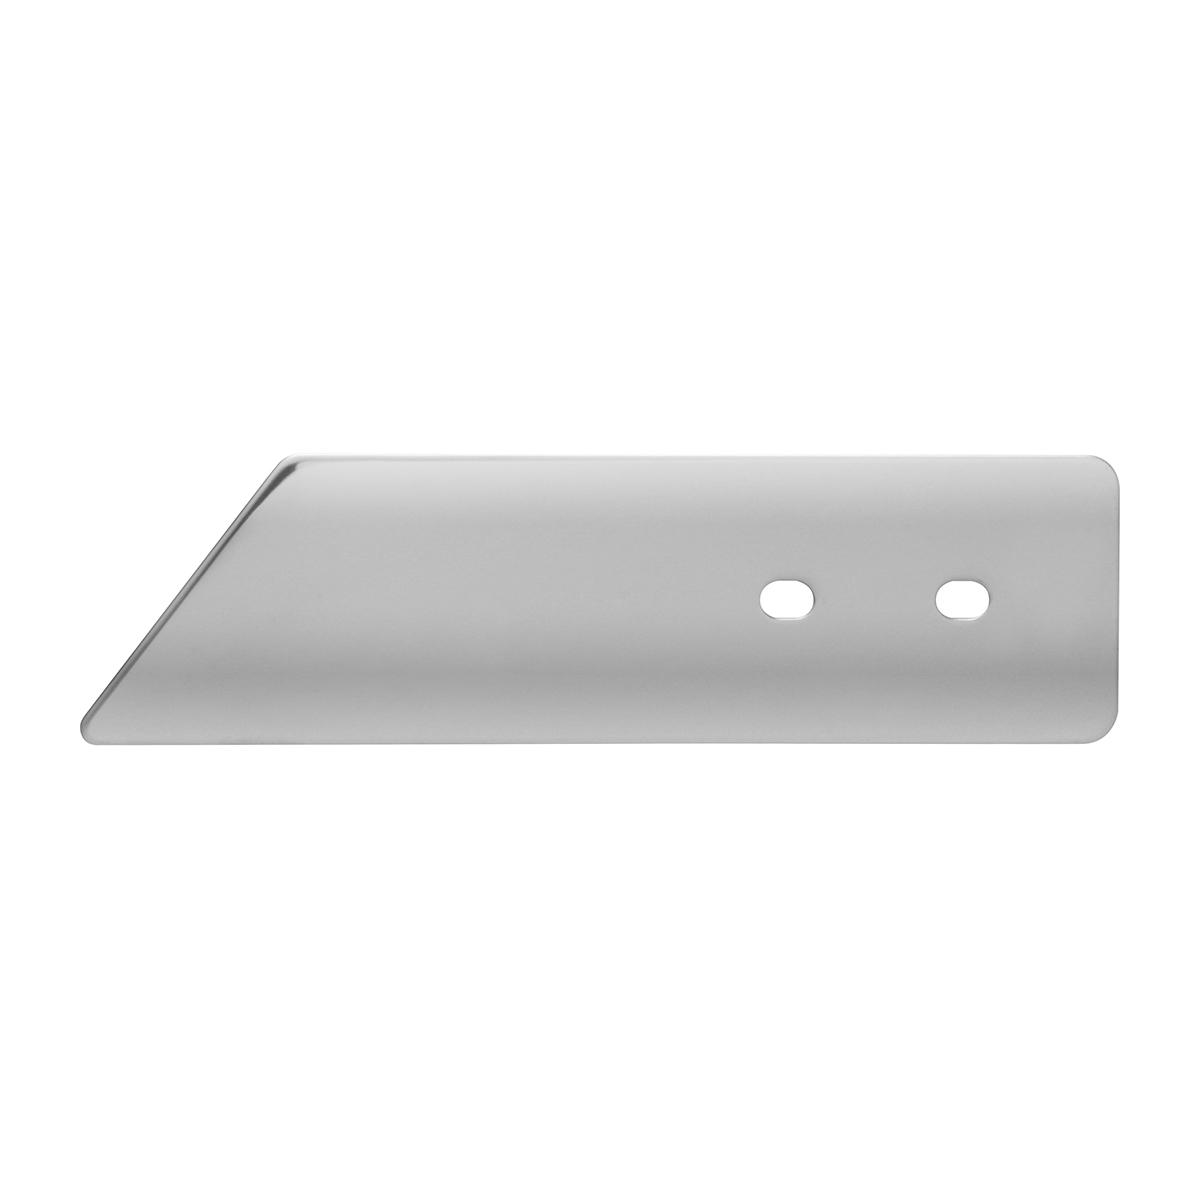 50230 FLT Stainless Steel Hood Latch Guard